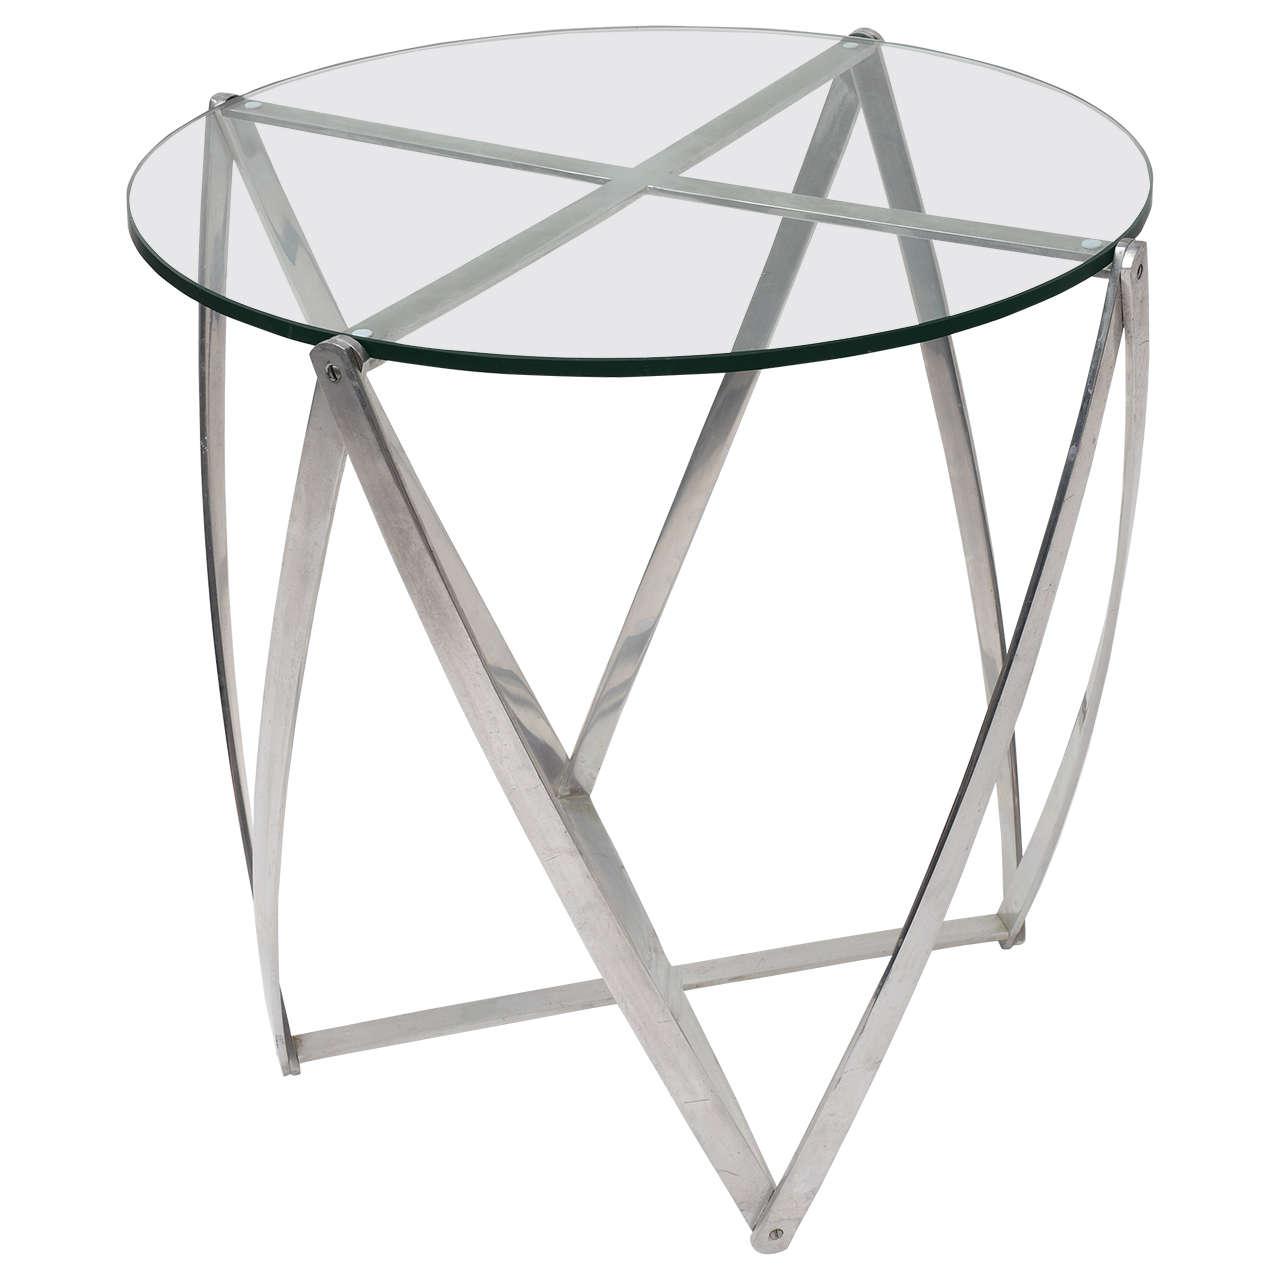 John Vesey Spool Table